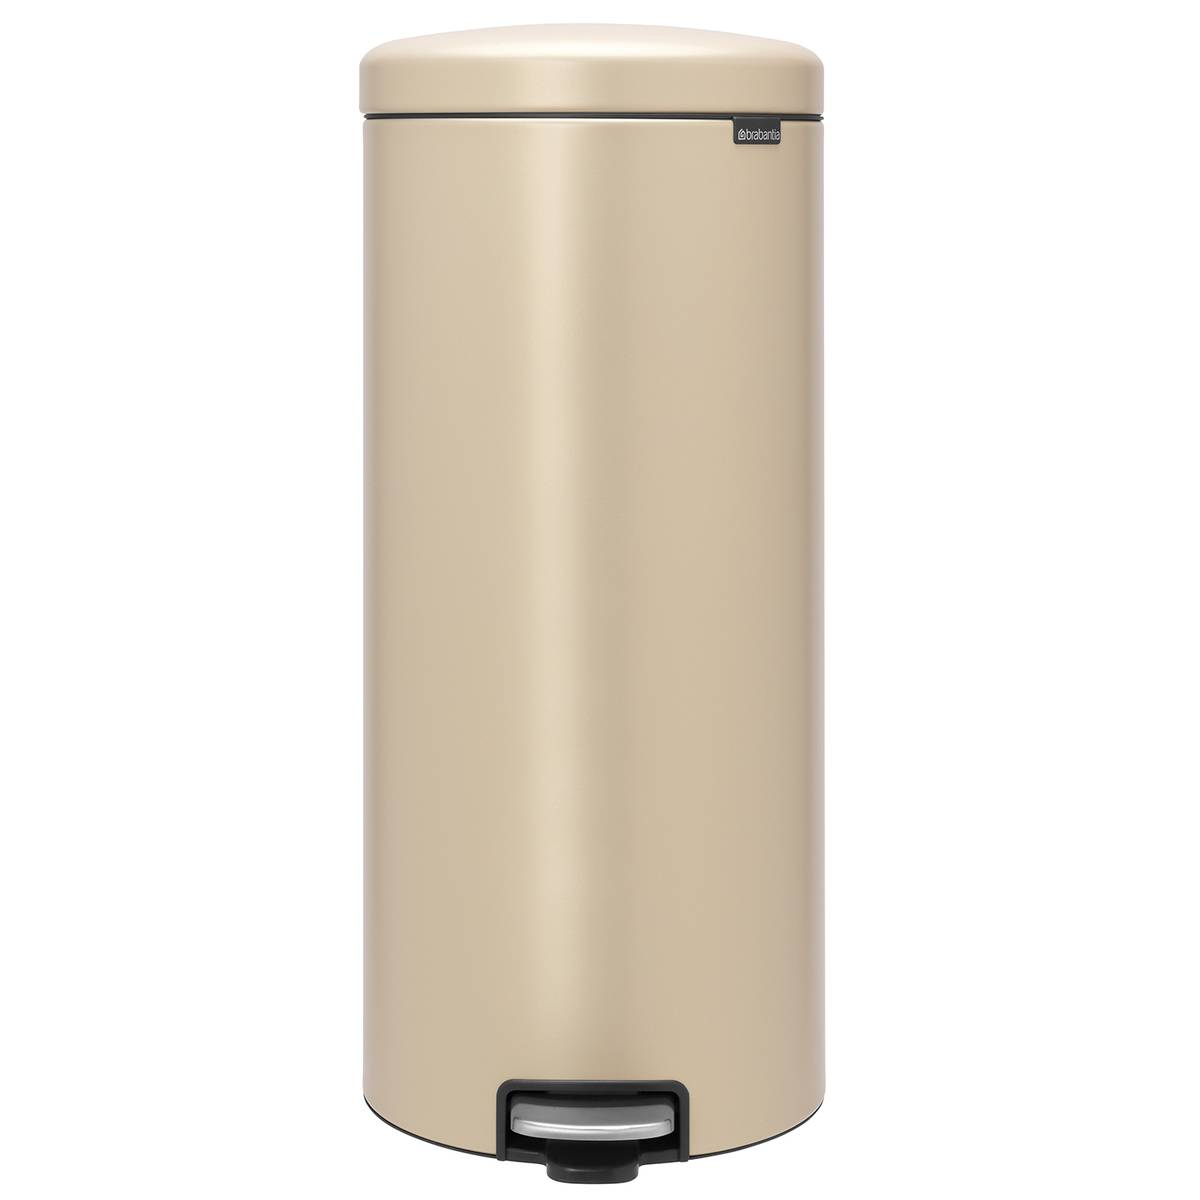 Brabantia newIcon poljinroska-astia 30 L, Sense of Luxury, kulta